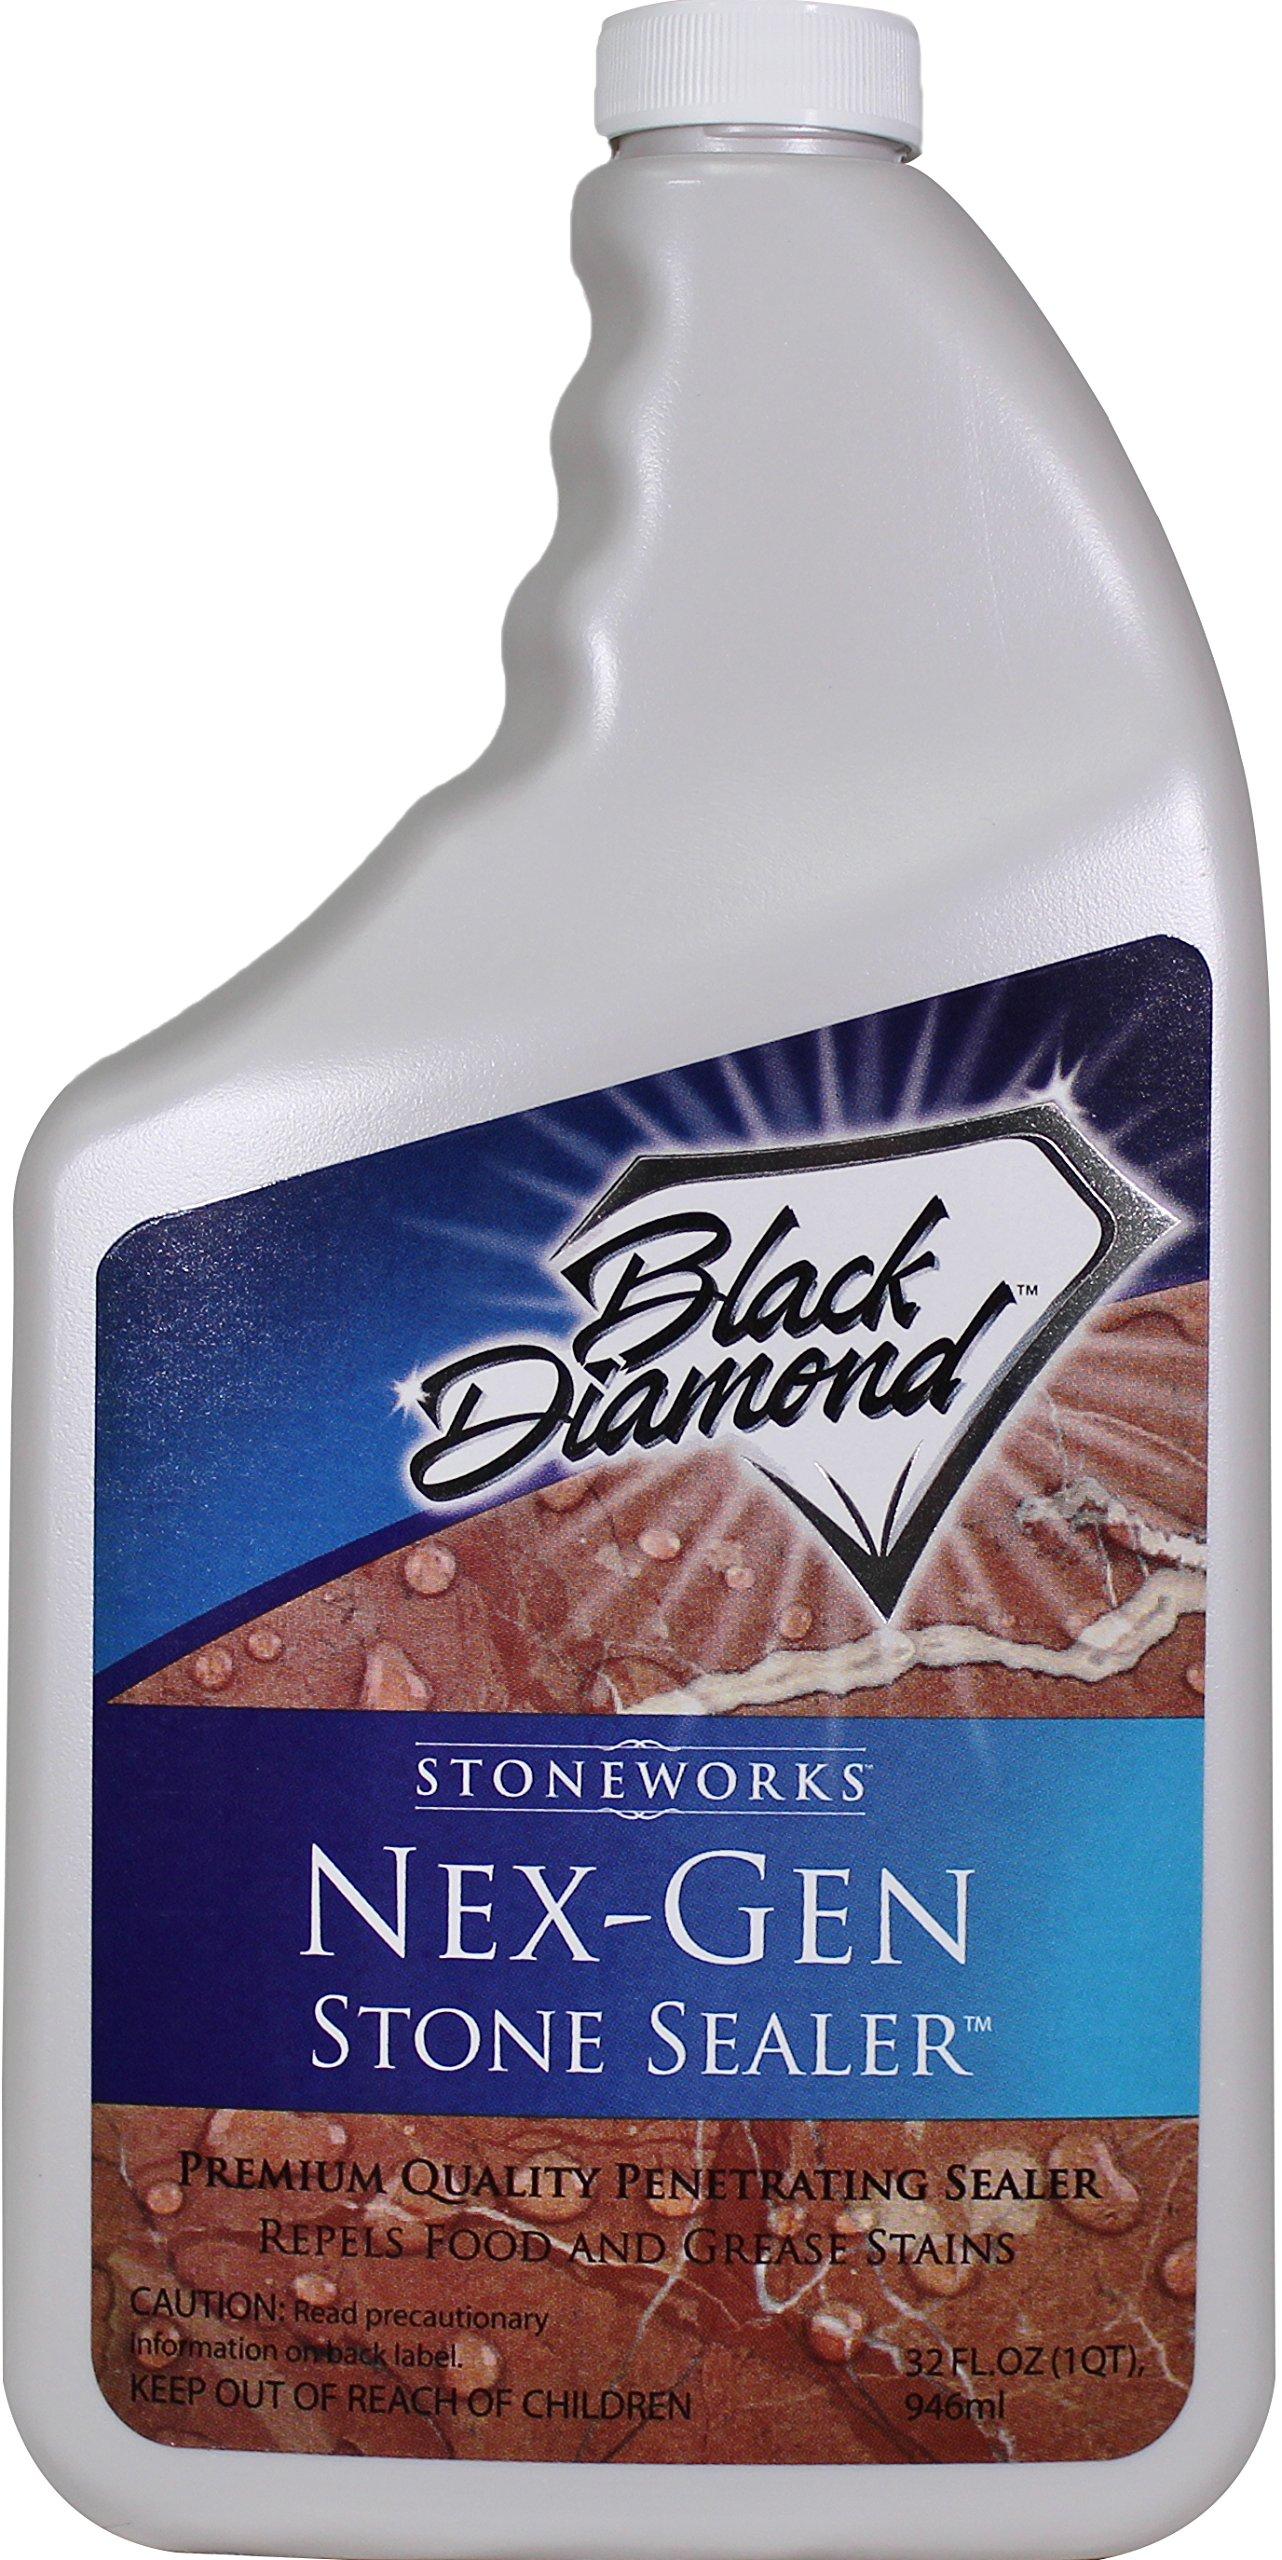 Black Diamond 679773002117 Nex-Gen Stone Sealer Penetrating Sealer, Seals and Protects, Granite, Marble, Travertine, Limestone, Grout, Tile, Brick and Slate,32-Ounce